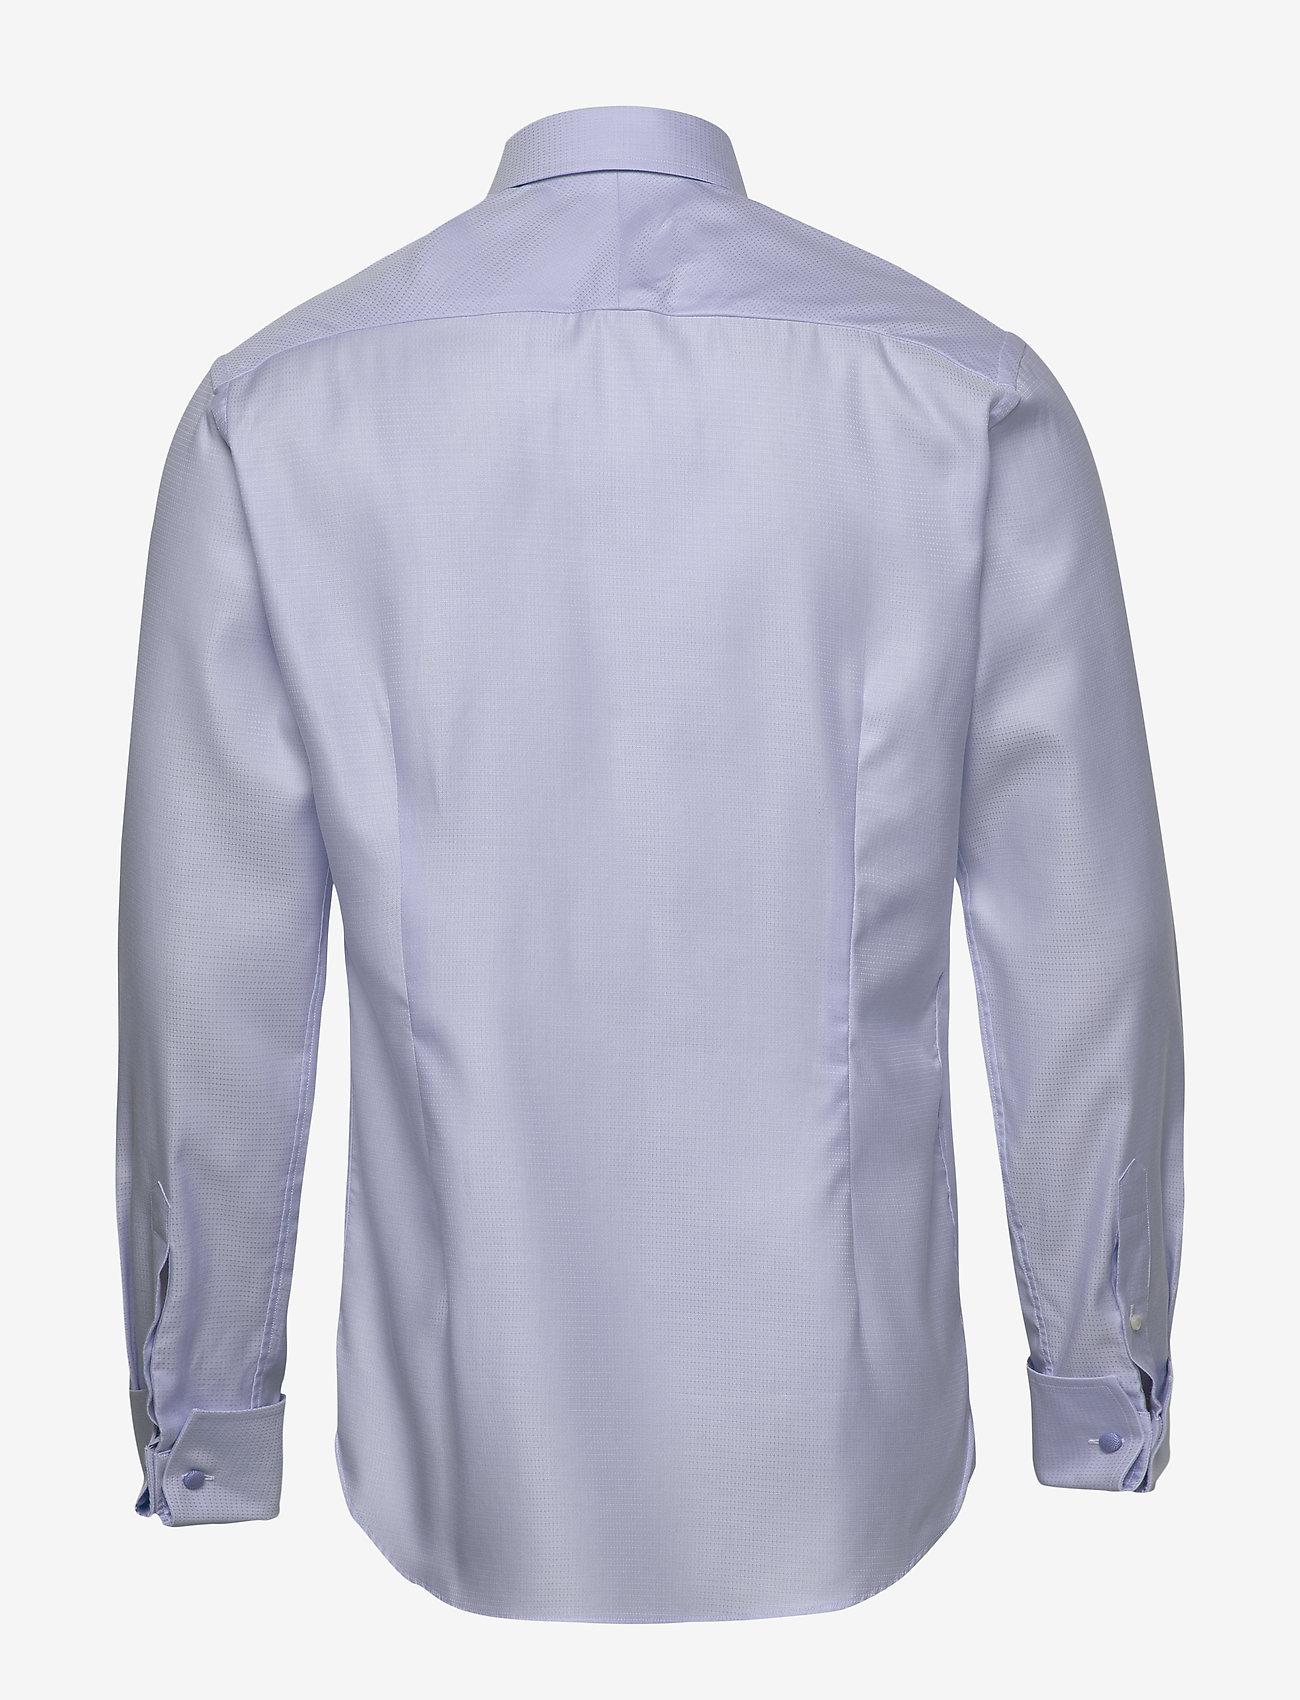 Eton Micro weave twill shirt - french cuffs - Skjorter BLUE - Menn Klær